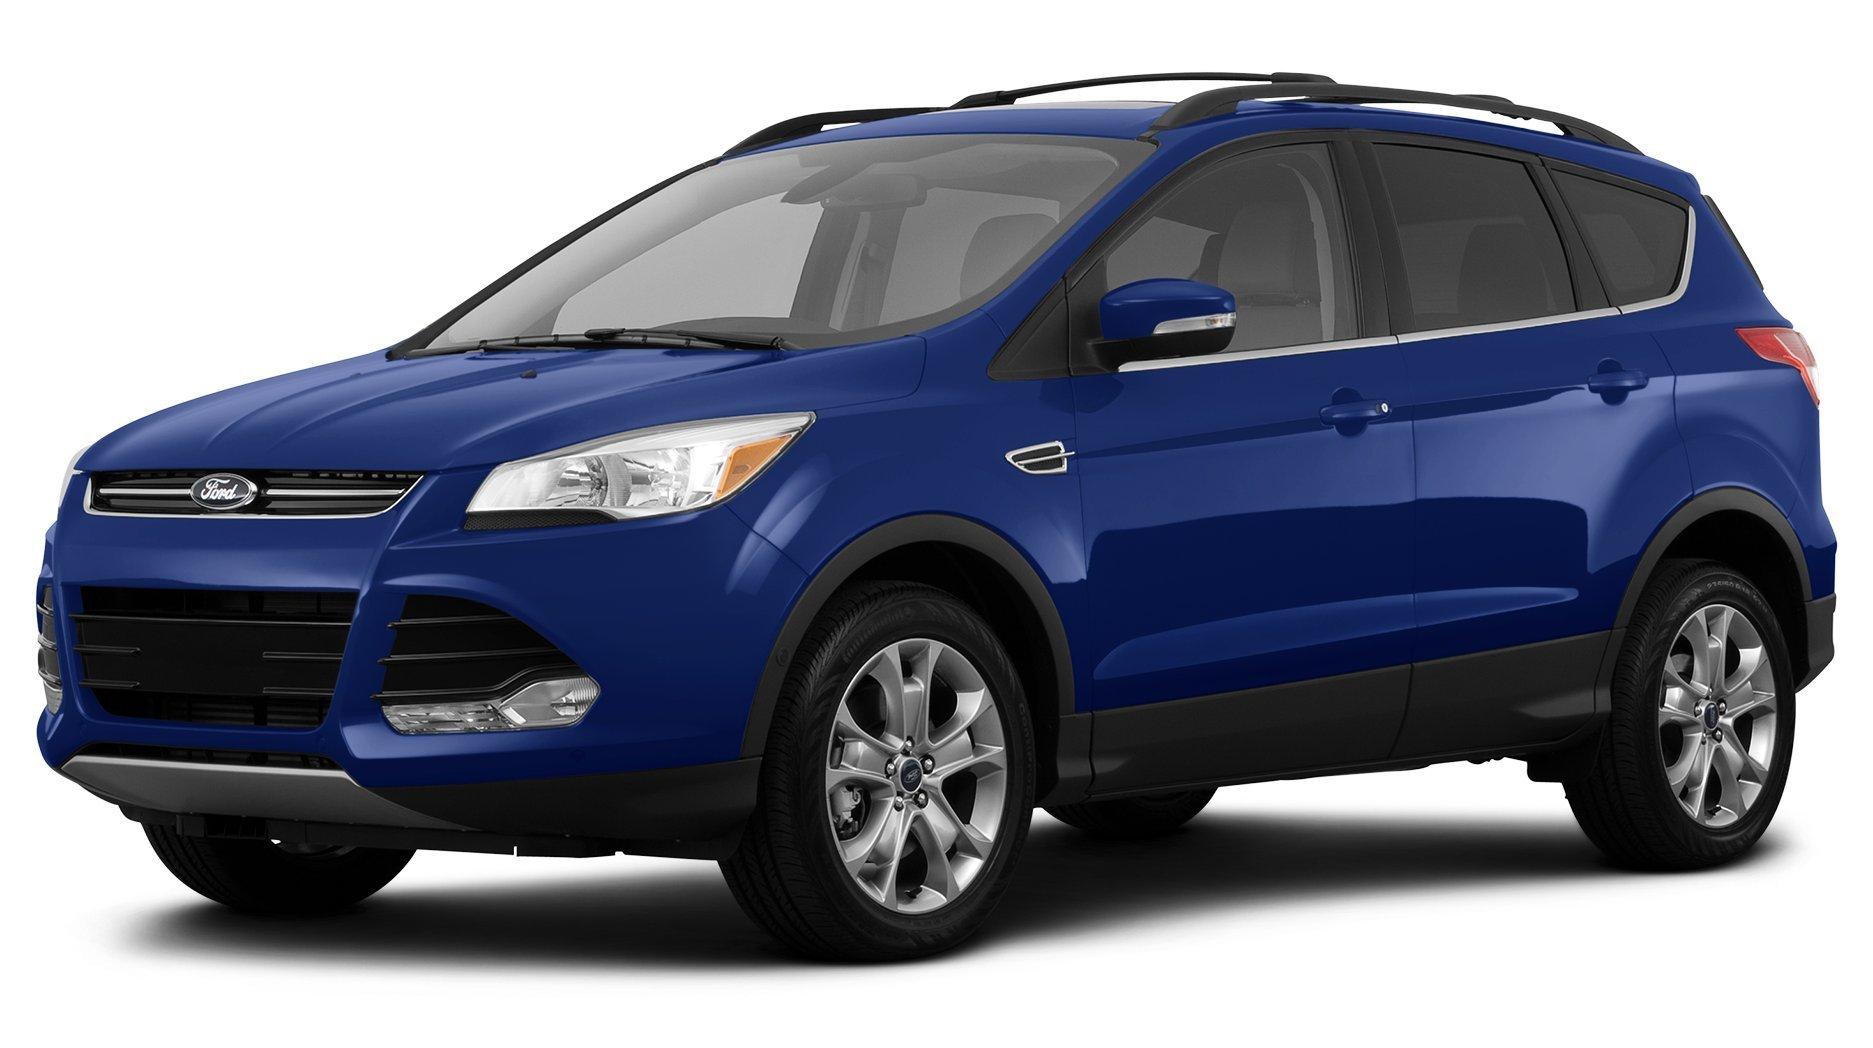 ... 2013 Ford Escape SEL, 4-Wheel Drive 4-Door. 2013 Toyota FJ Cruiser ...